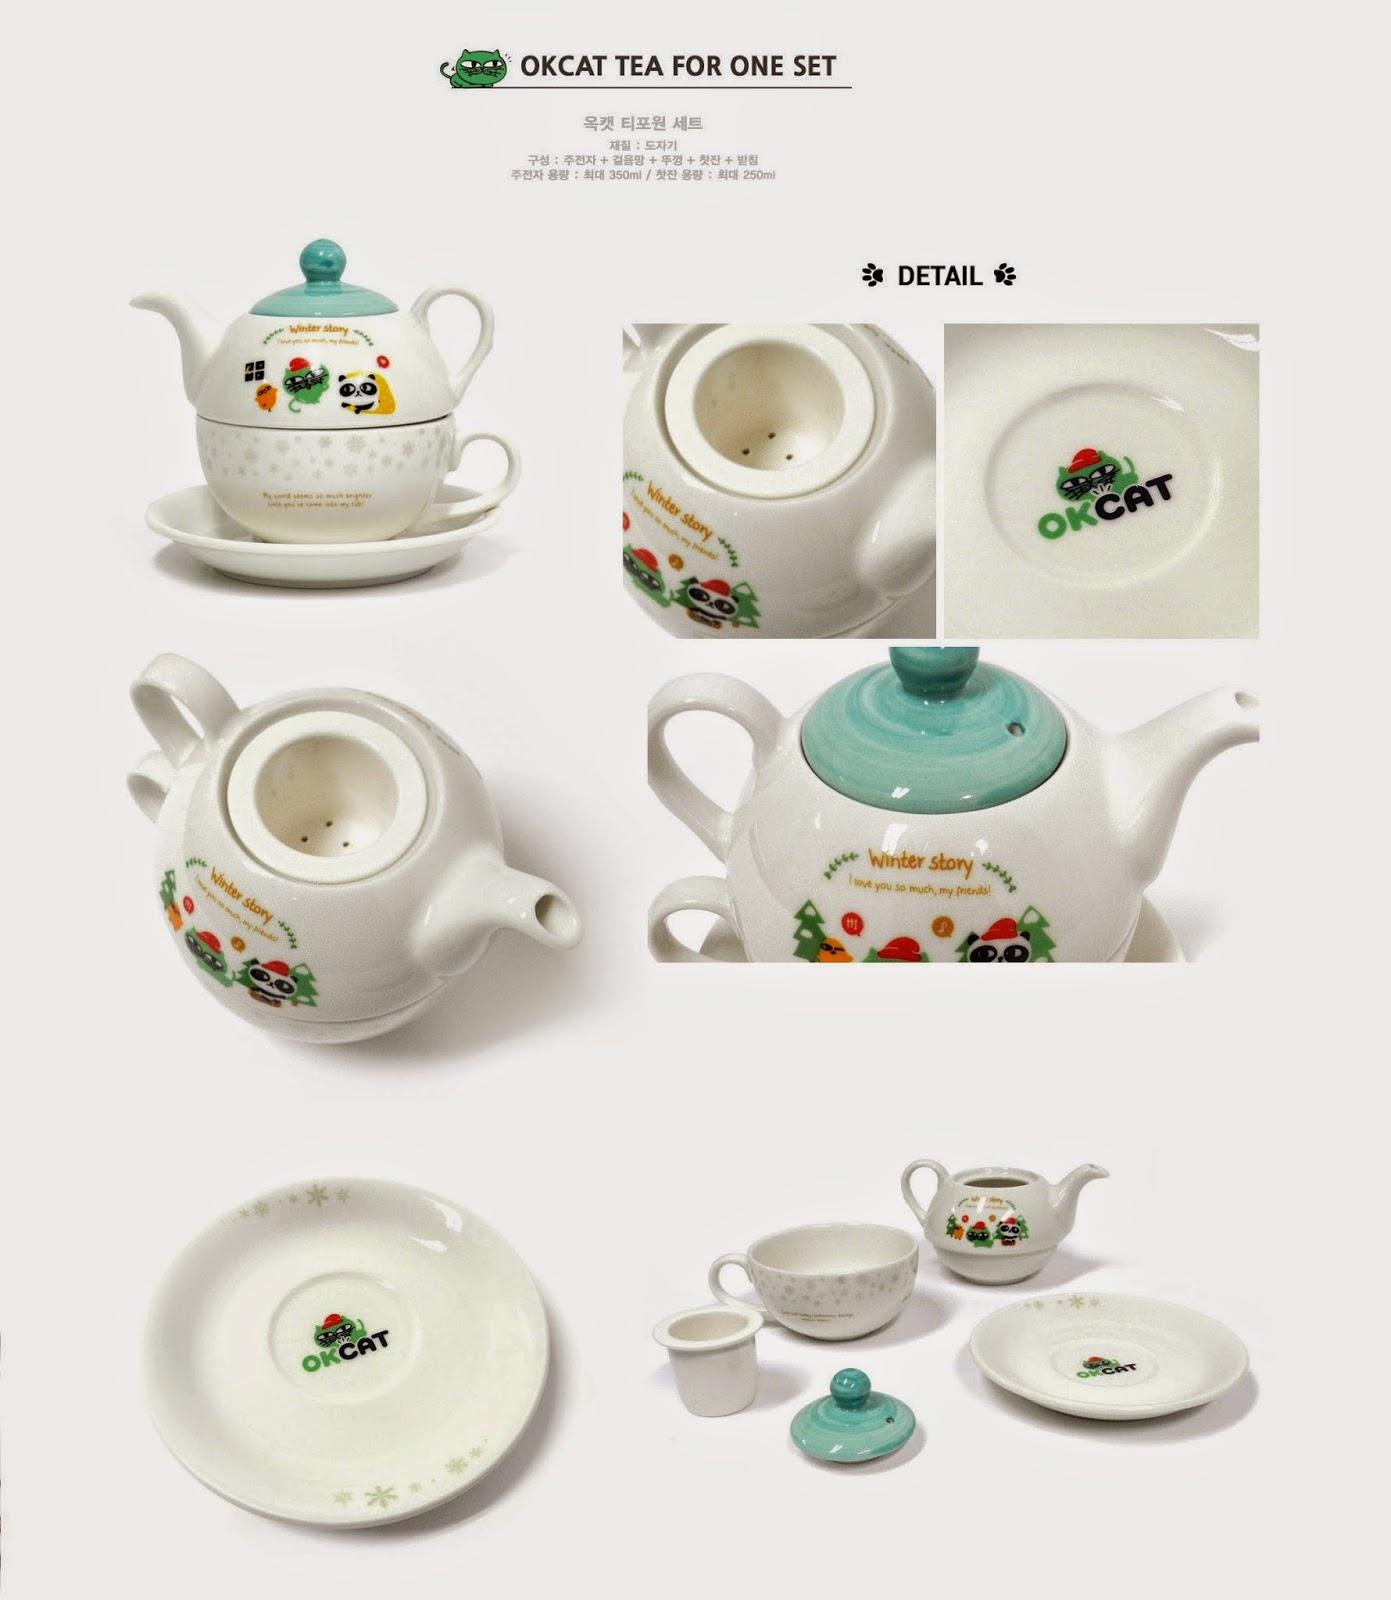 kedai kpop my   merchandise  okcat tea for one set